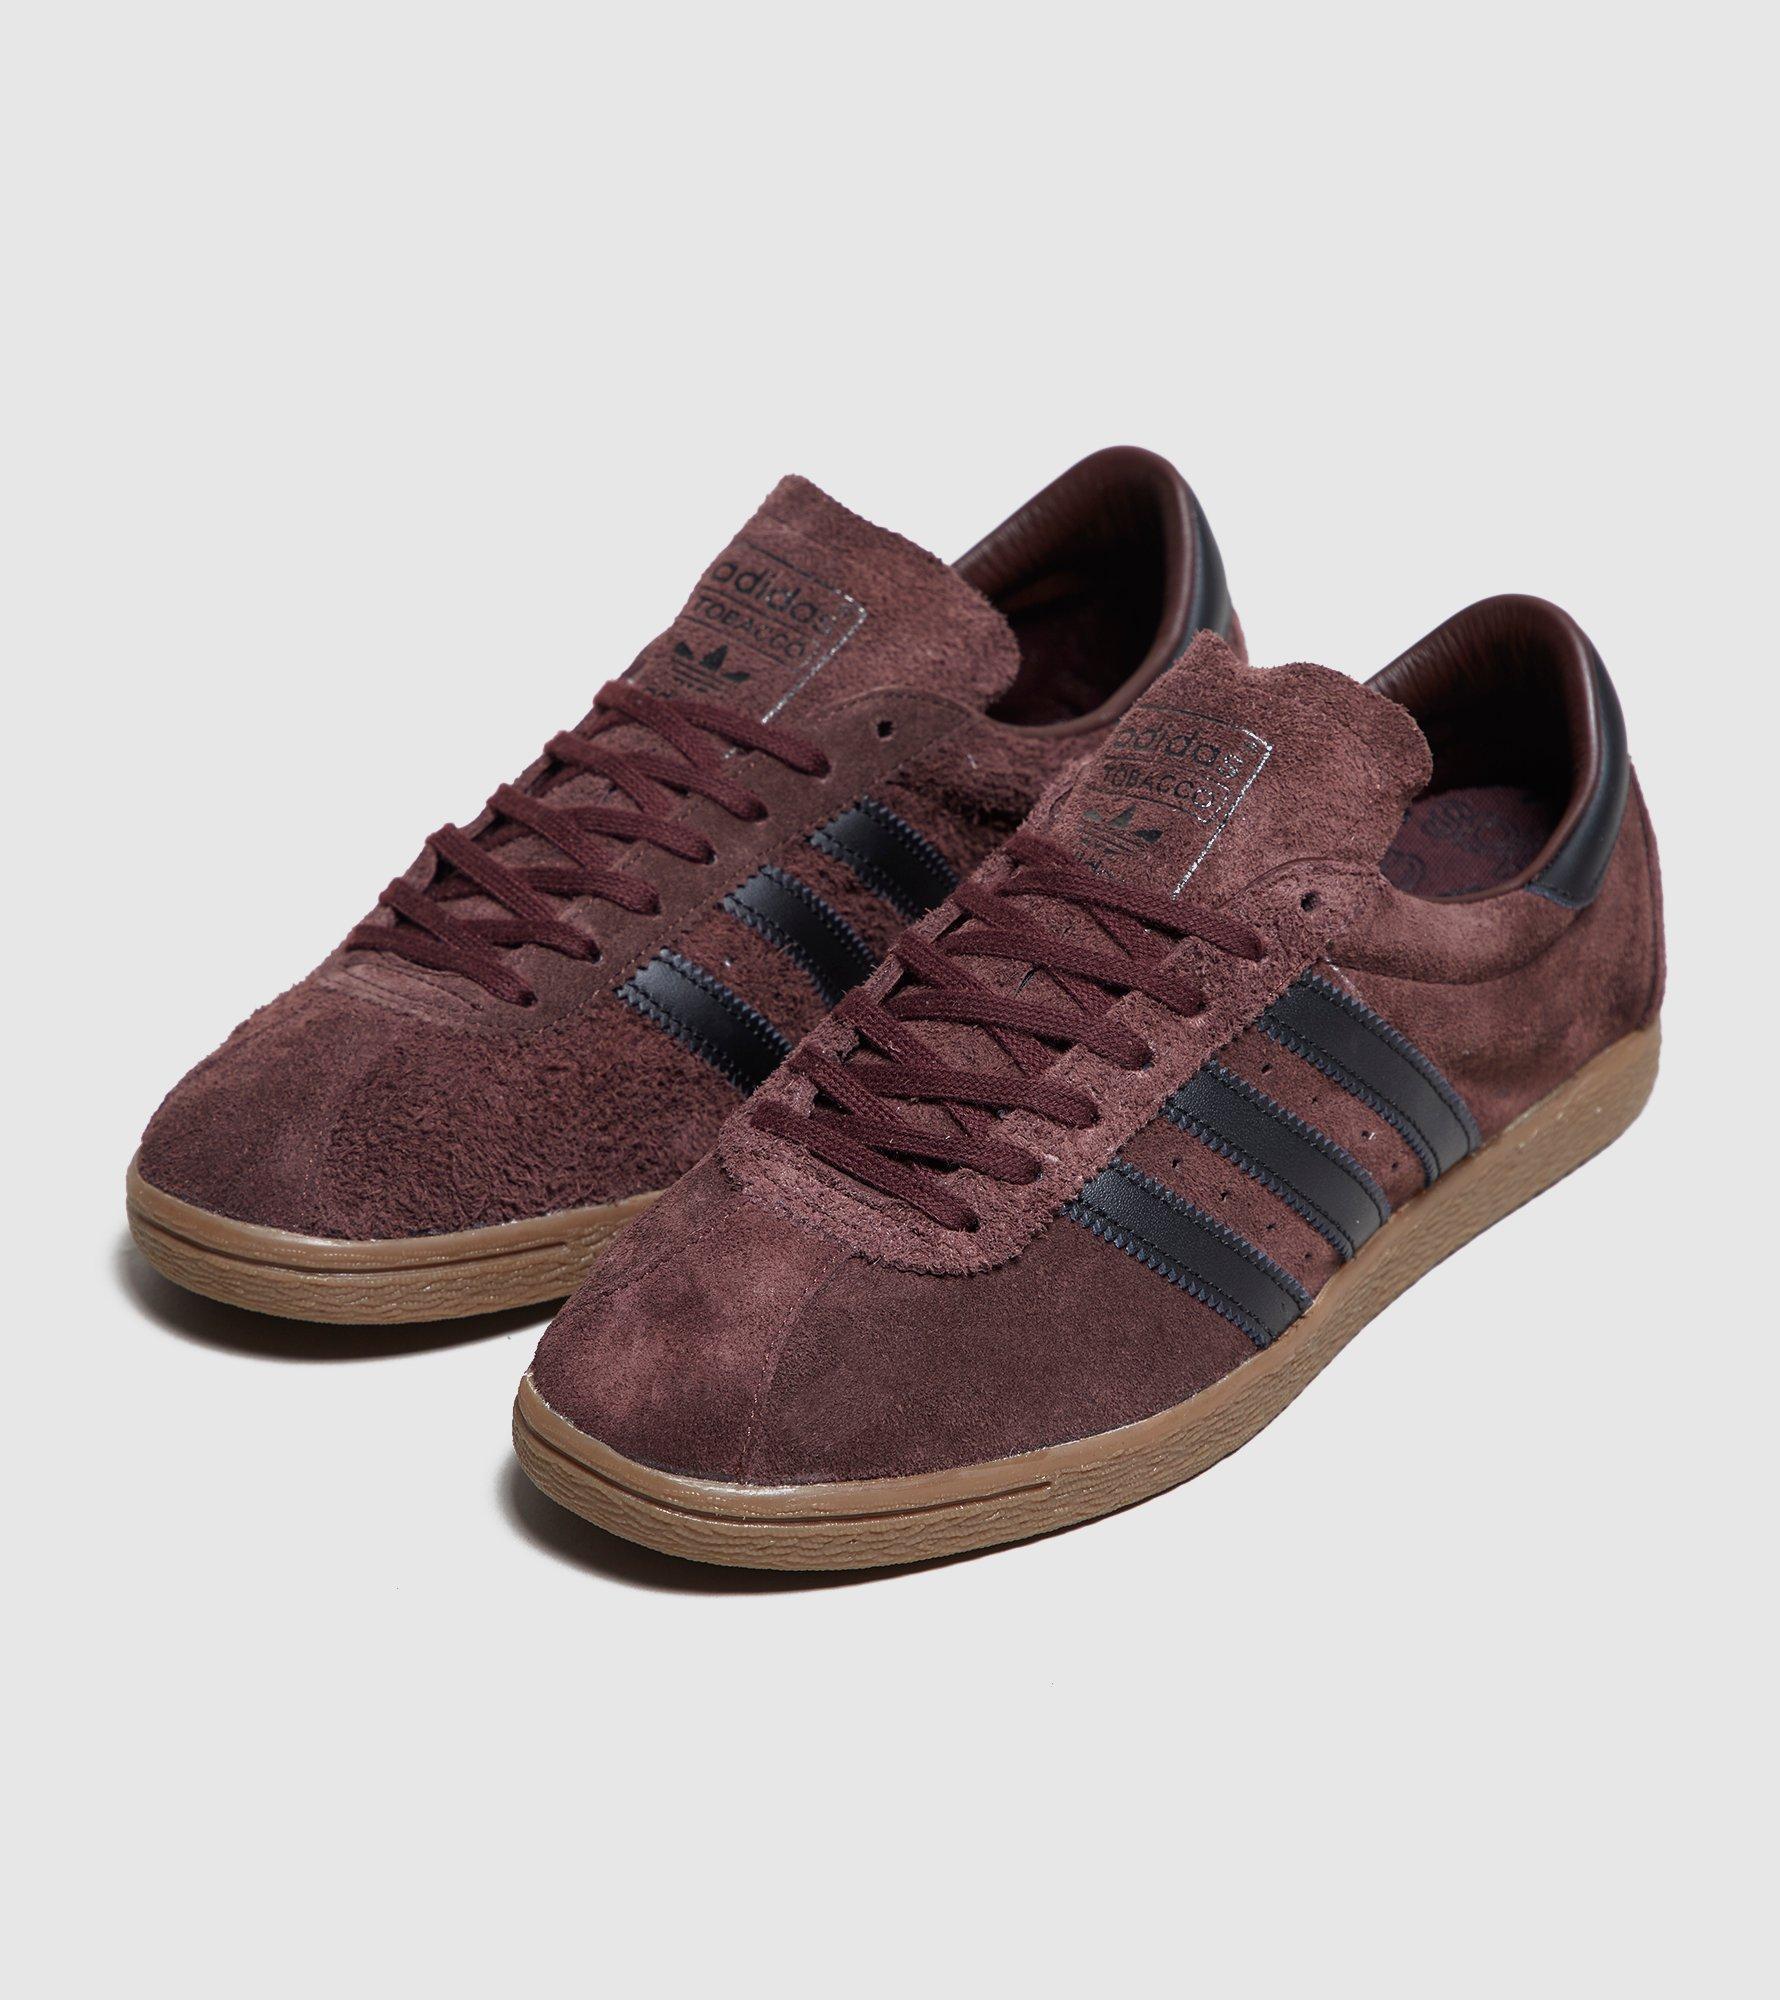 db1fa56af10a29 Lyst - adidas Originals Tobacco in Brown for Men